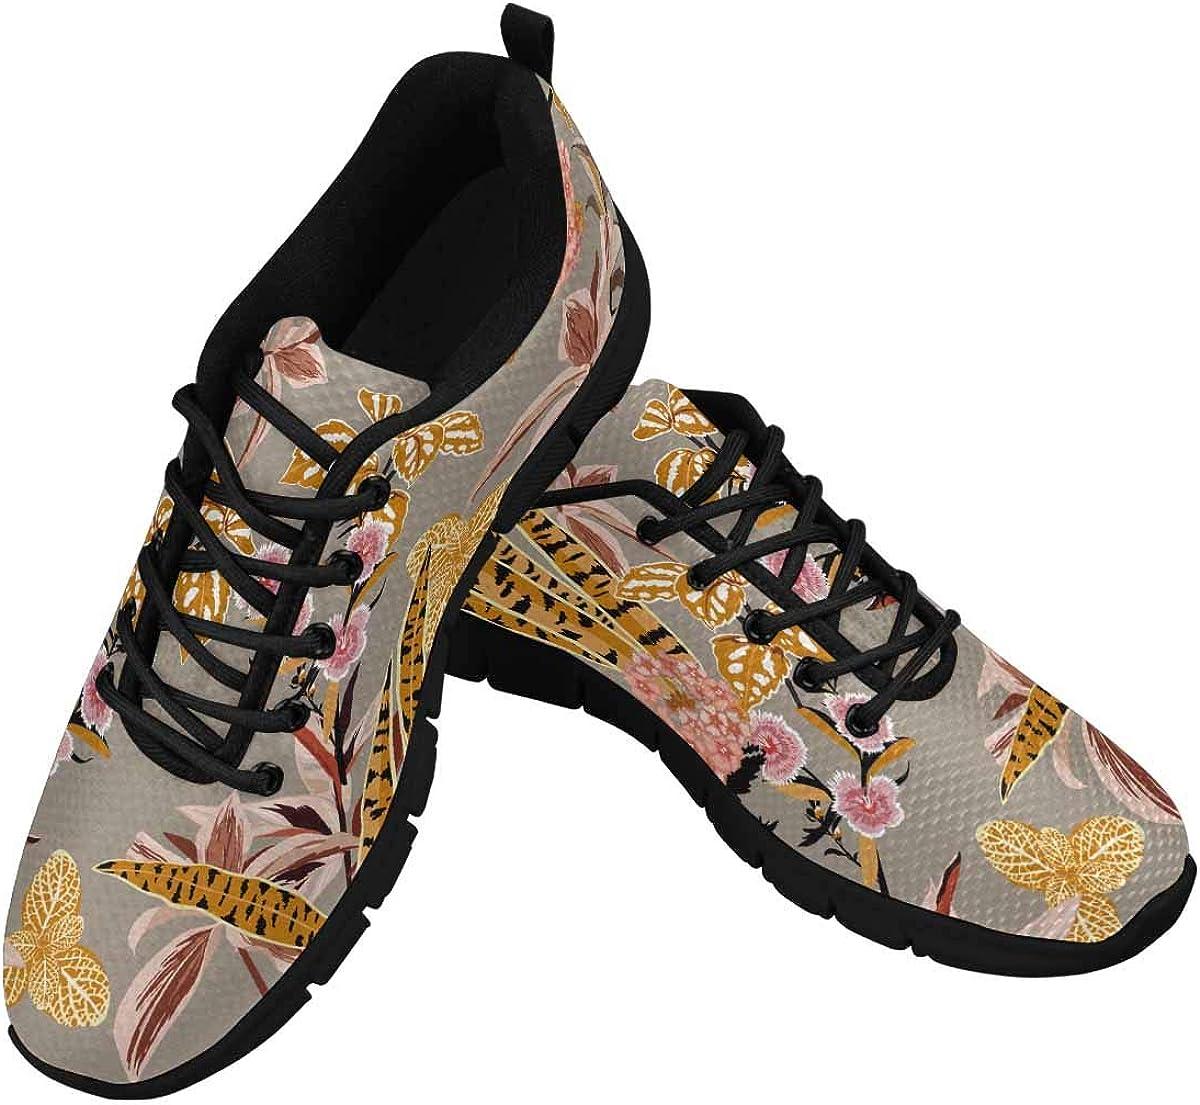 INTERESTPRINT Beautiful Vintage Tropical Pattern Women's Breathable Non Slip Sneakers